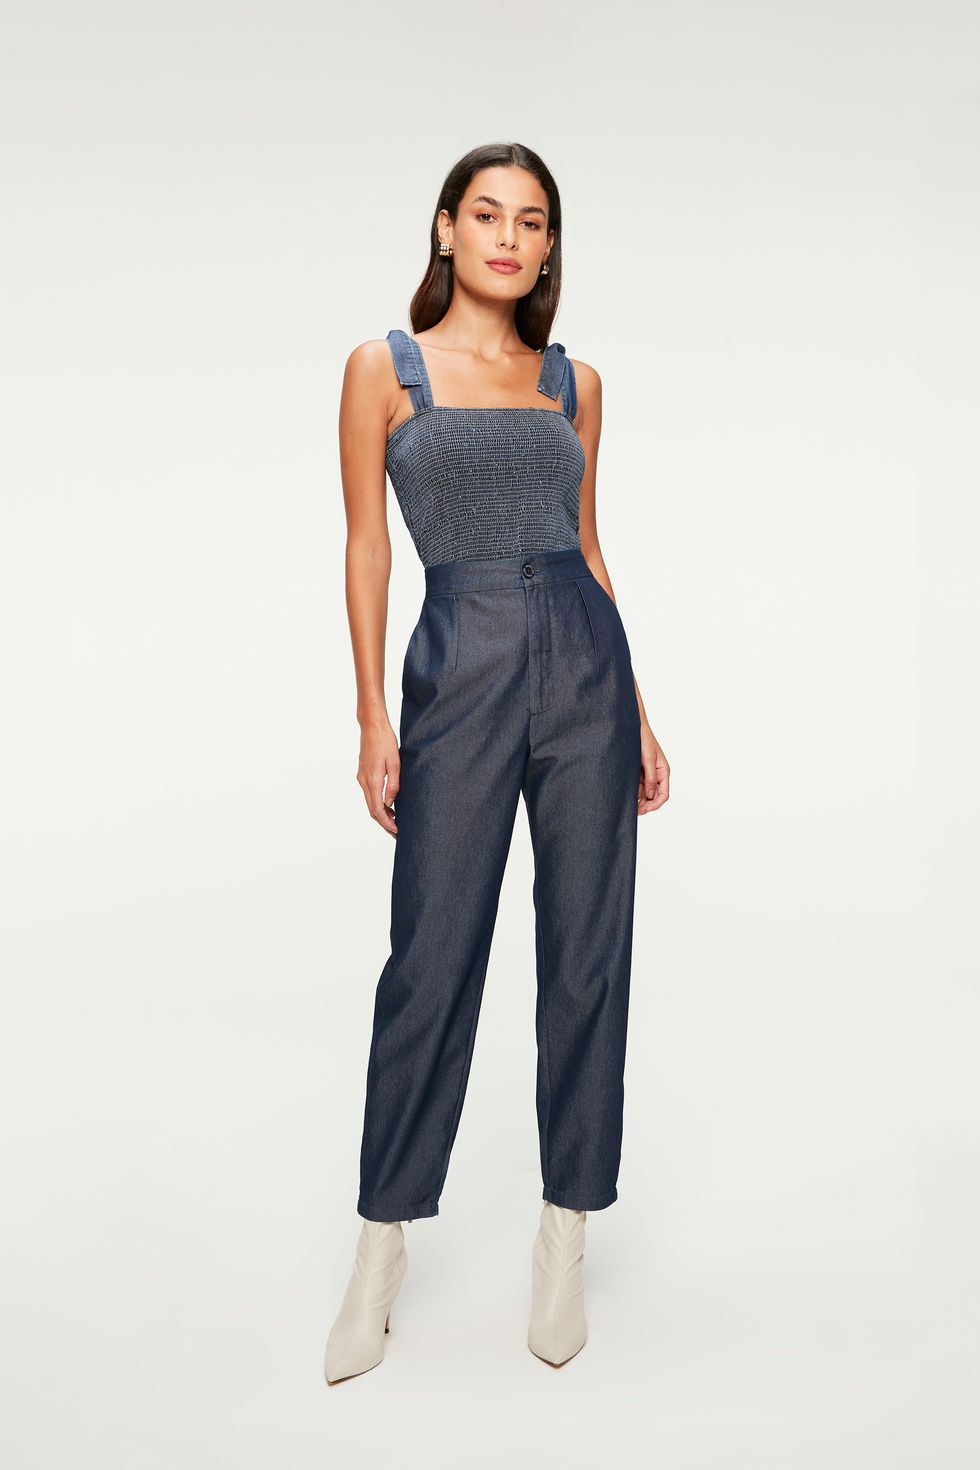 Calça-Jeans-Leve-Chino-Cropped-Frente--